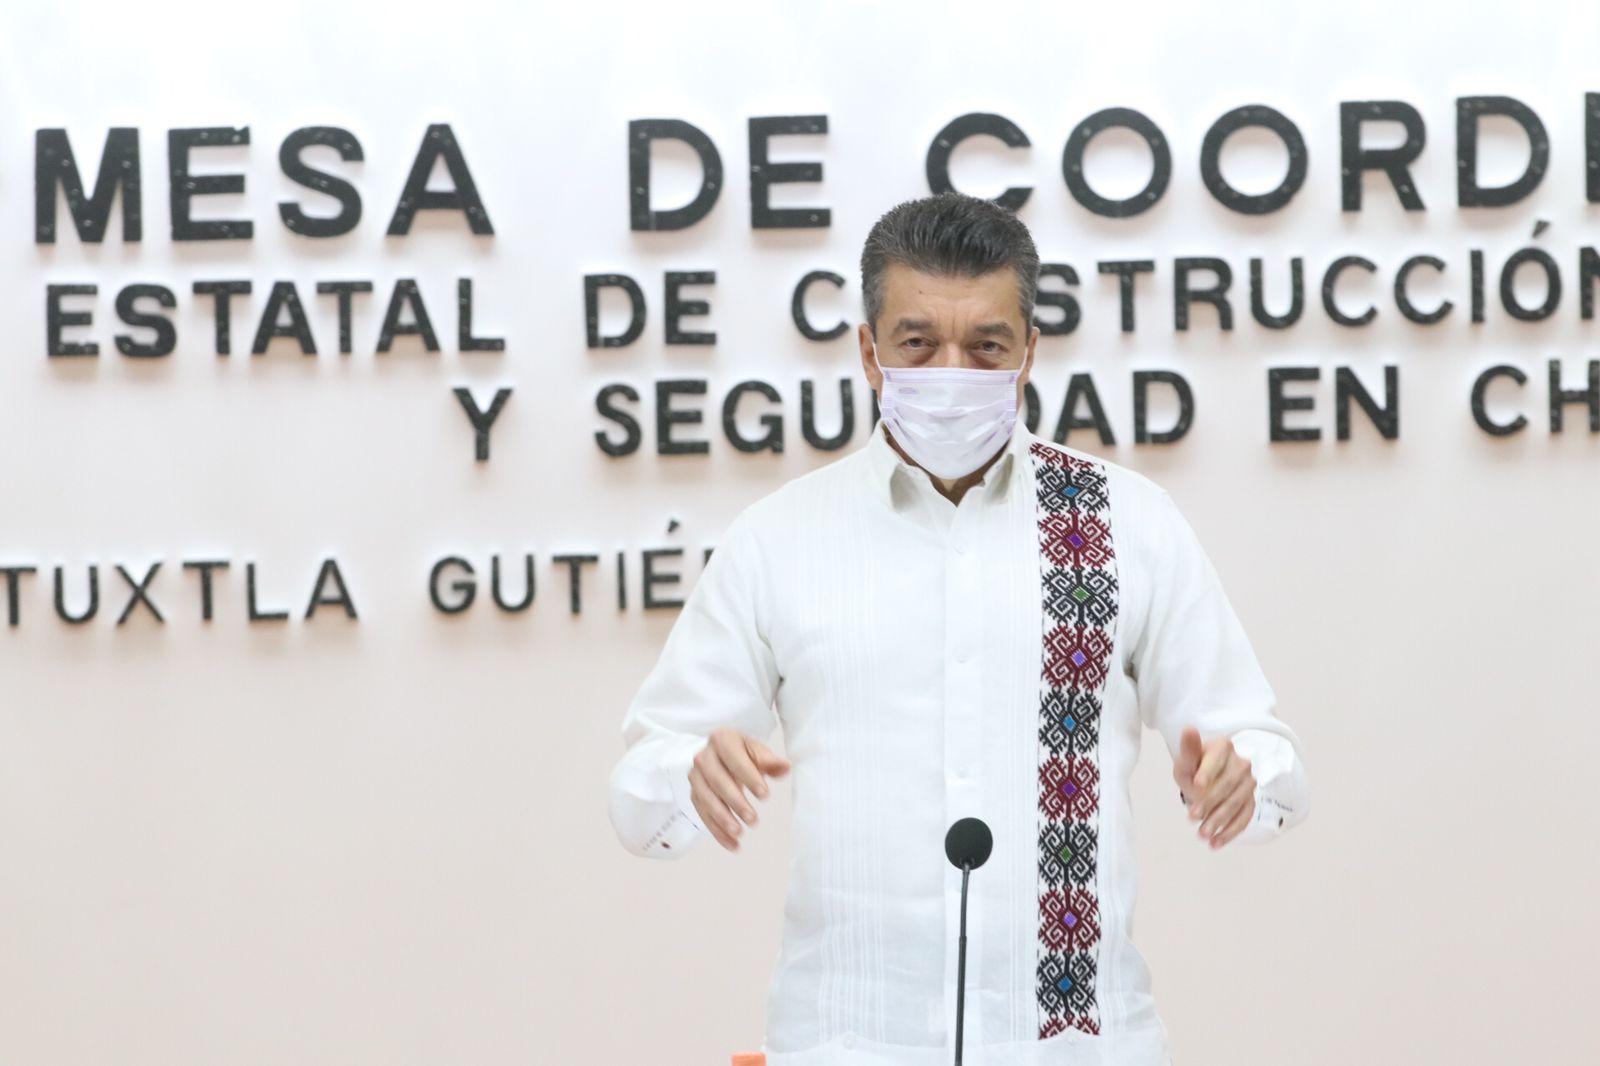 Chiapas avanza con pasos firmes en materia de respeto a los derechos humanos: Rutilio Escandón